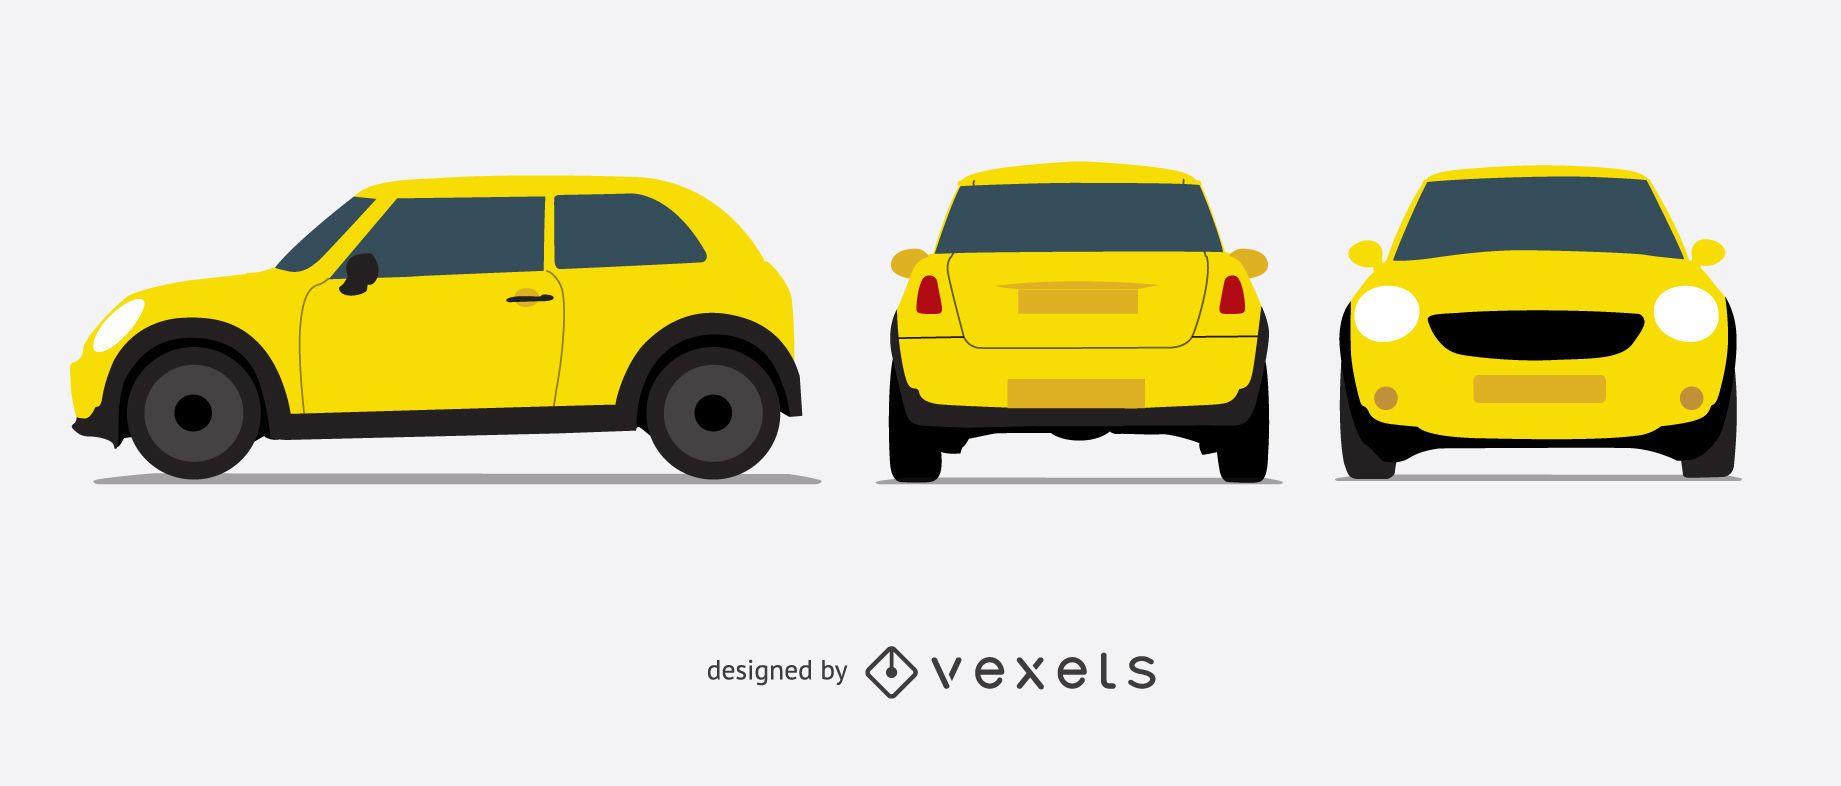 Conjunto de ilustraci?n de coche amarillo